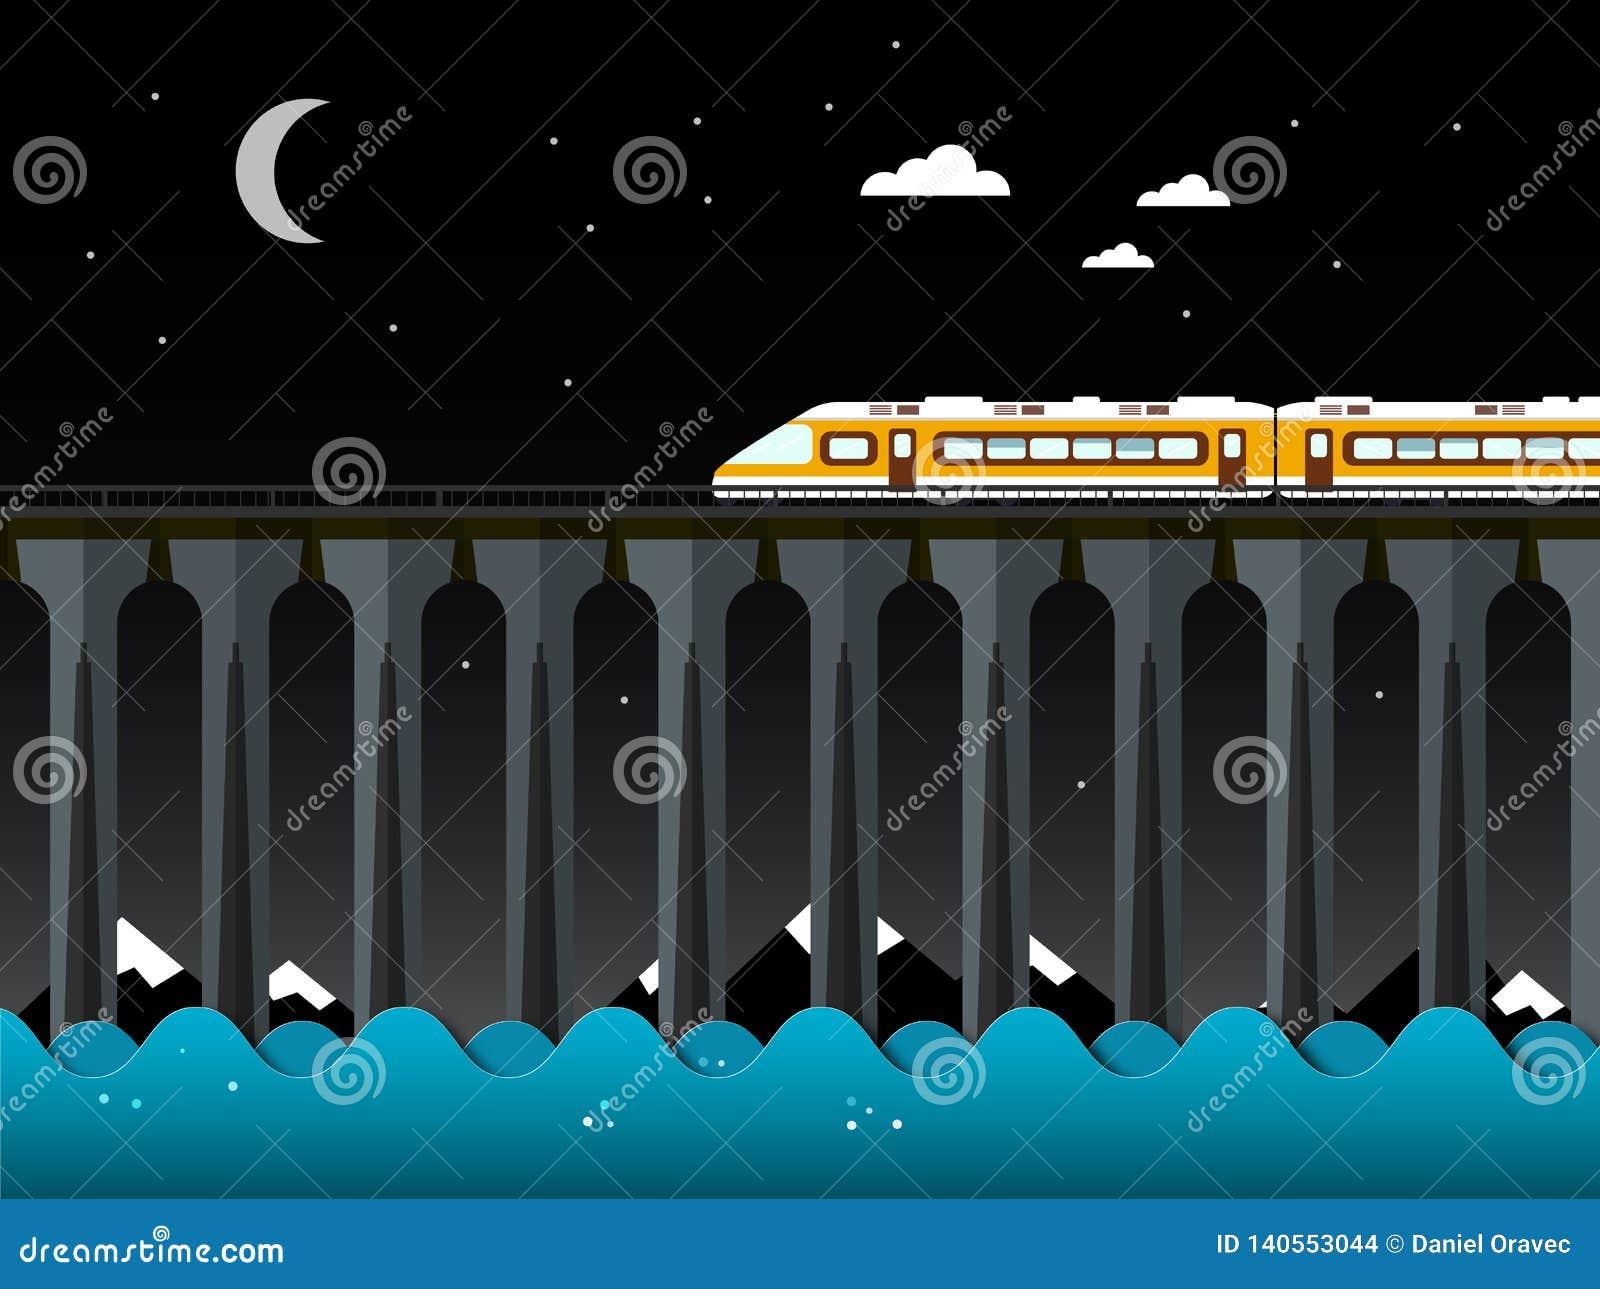 Night Landscape with Train and Bridge over the Sea